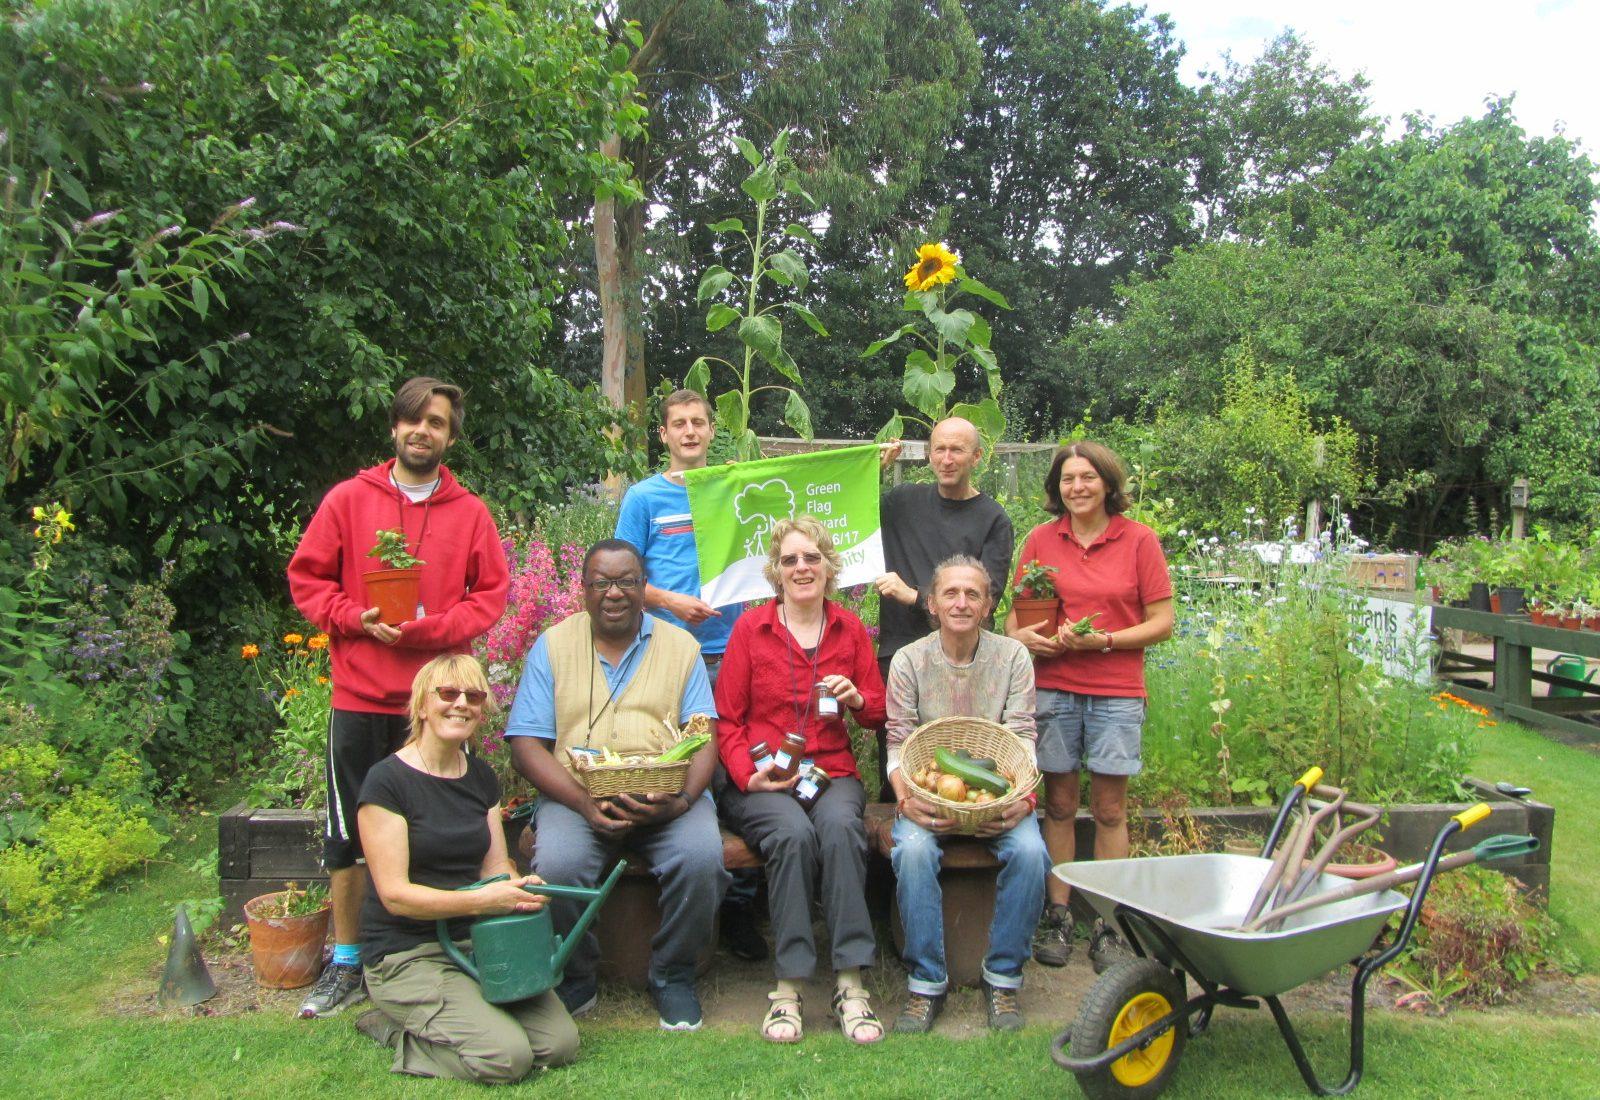 Martineau_garden_green_flag_award.jpg